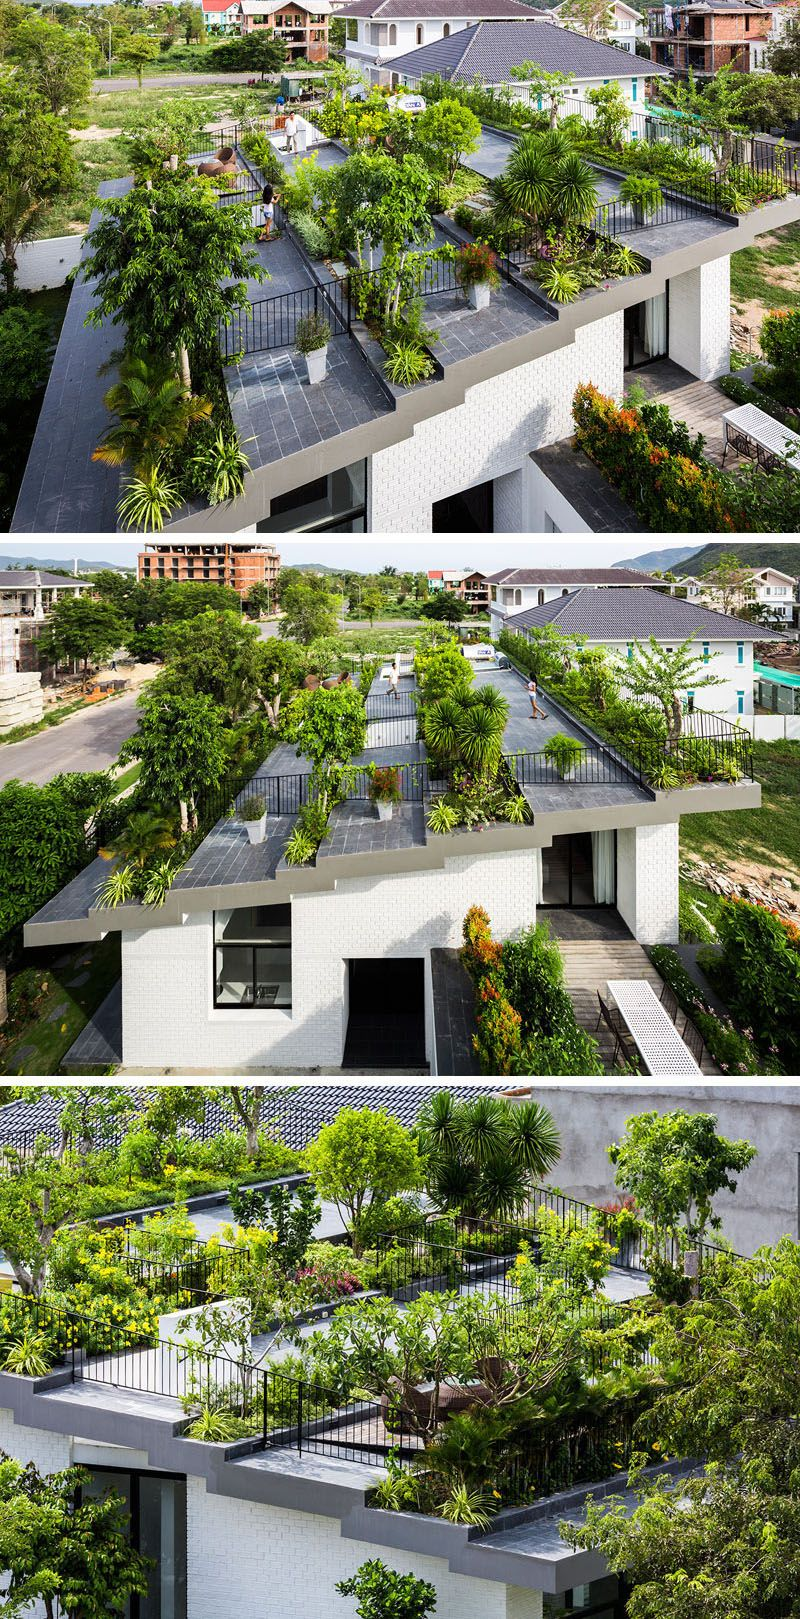 These 10 Rooftop Decks Are Always Ready For Outdoor Entertaining Garden Architecture Rooftop Garden Garden Design